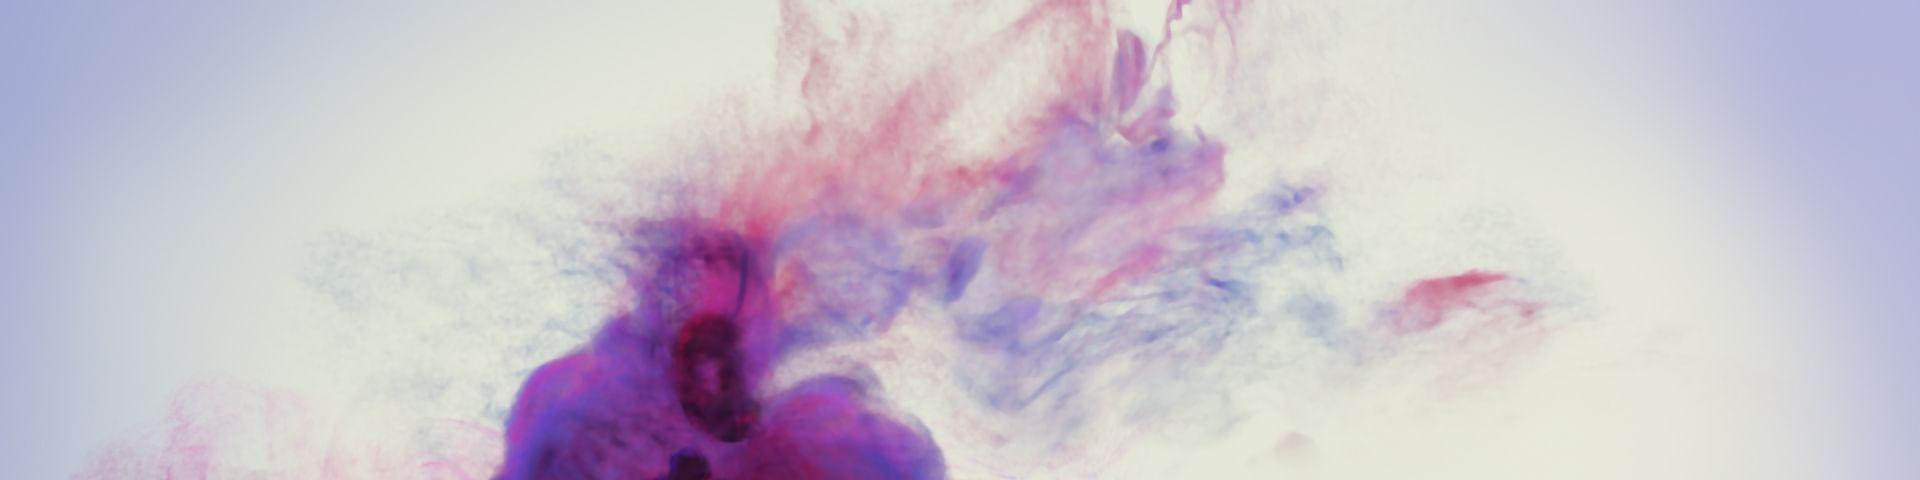 Na rewersie mapy: granice